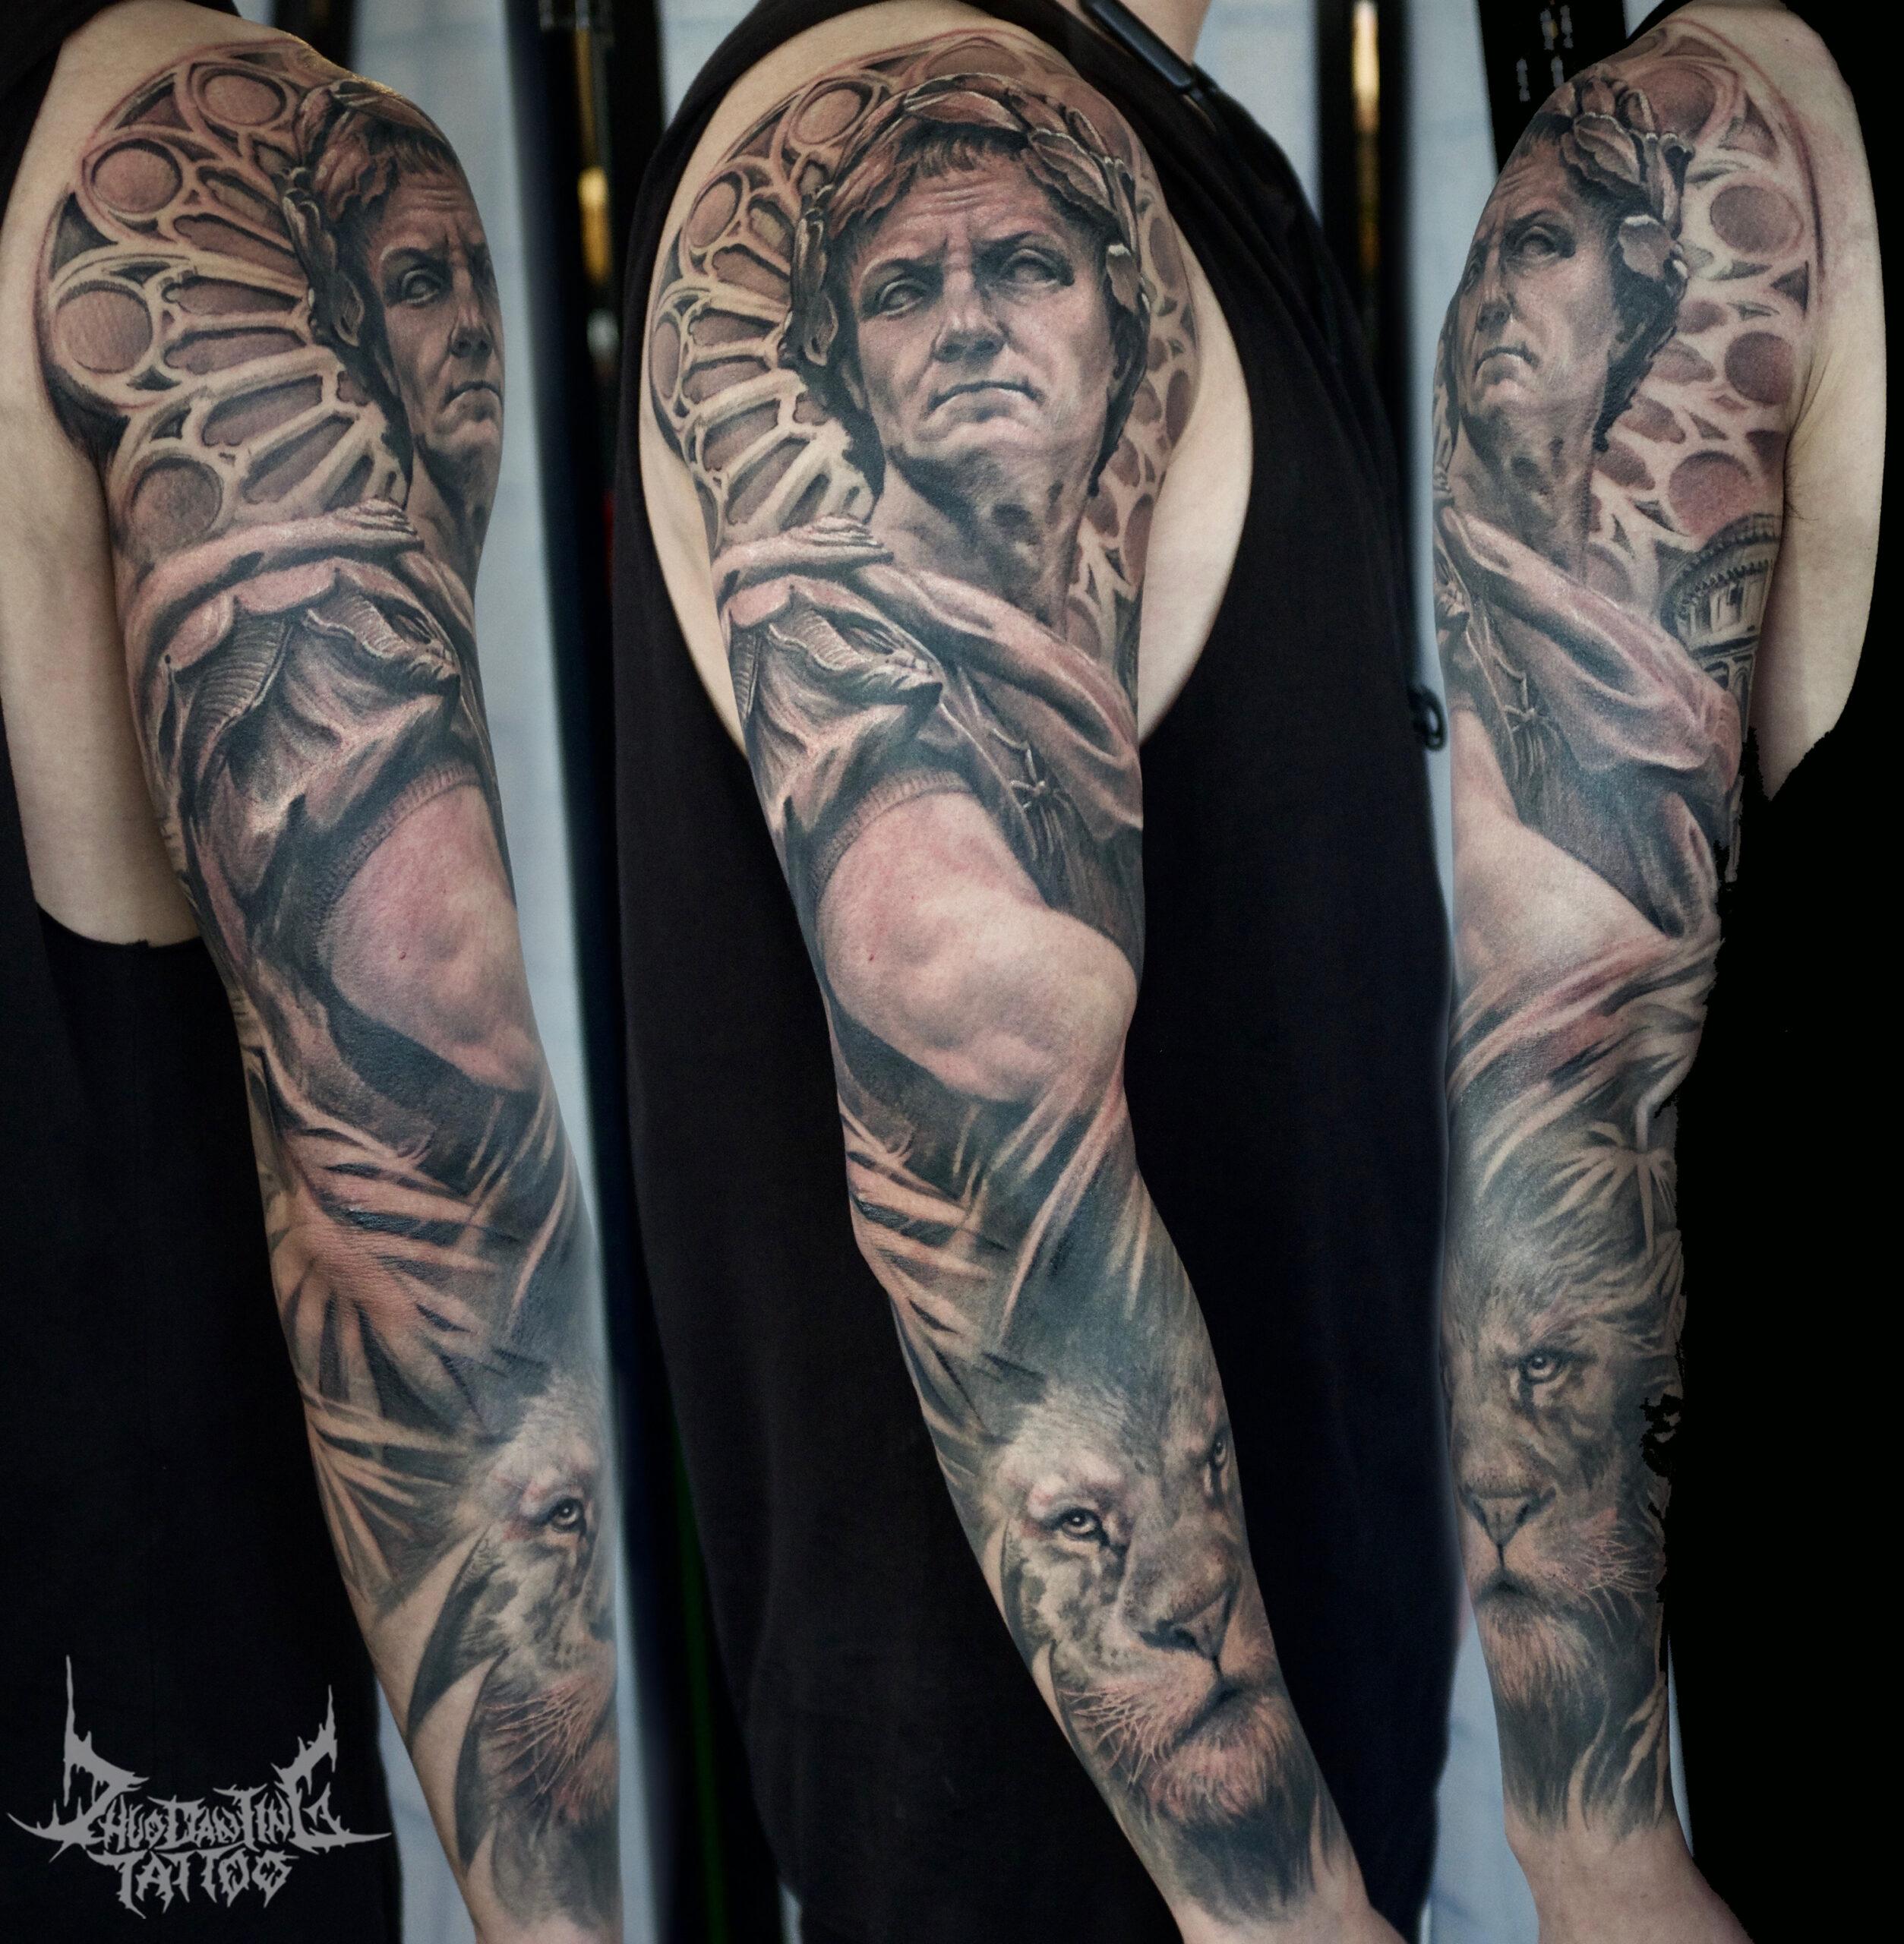 zhuo dan ting tattoo work 卓丹婷纹身作品 凯撒大帝纹身 1